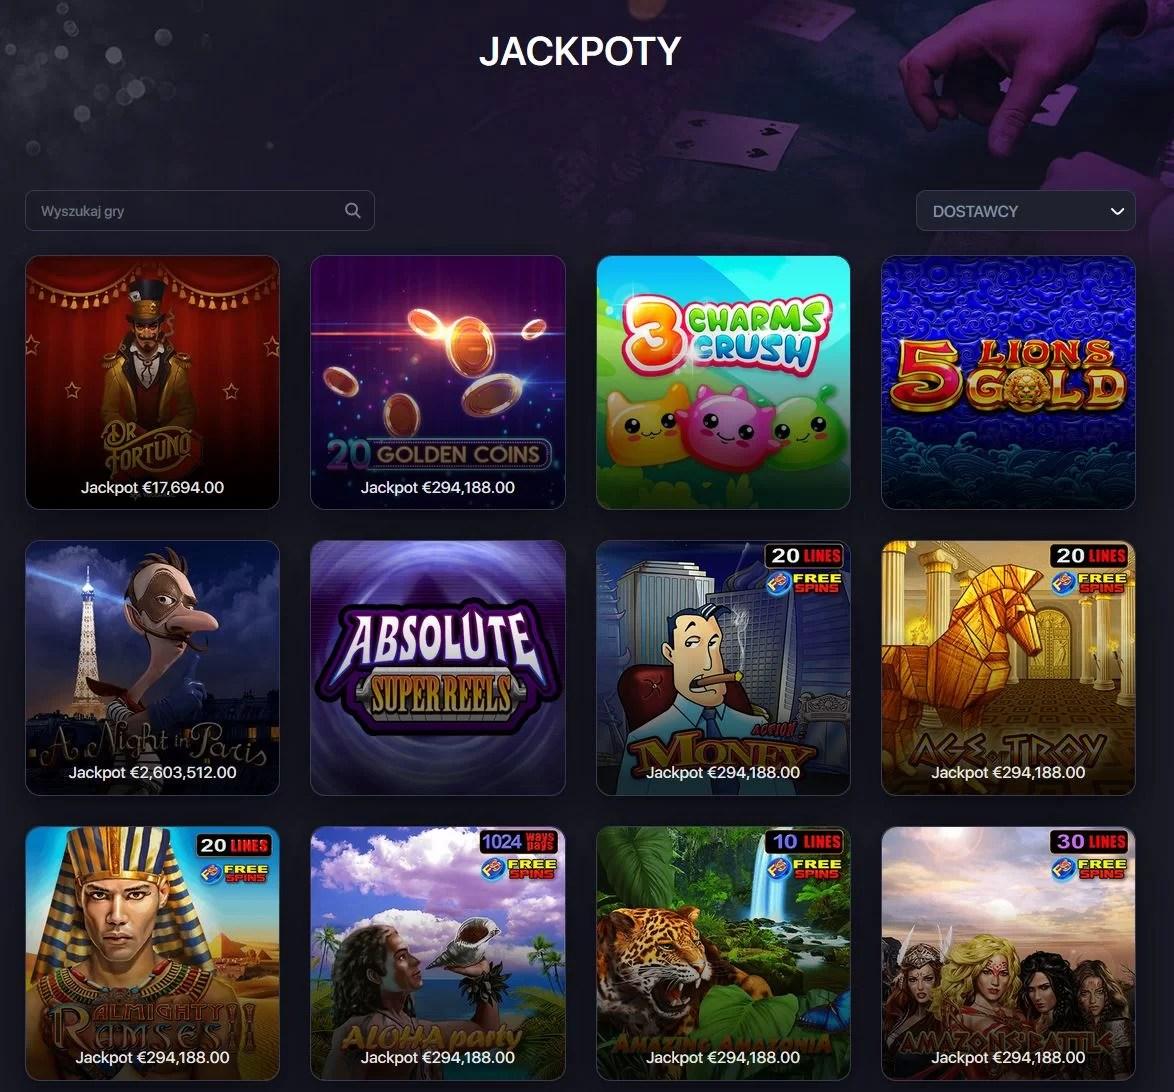 Praise casino - Jackpoty kasyno